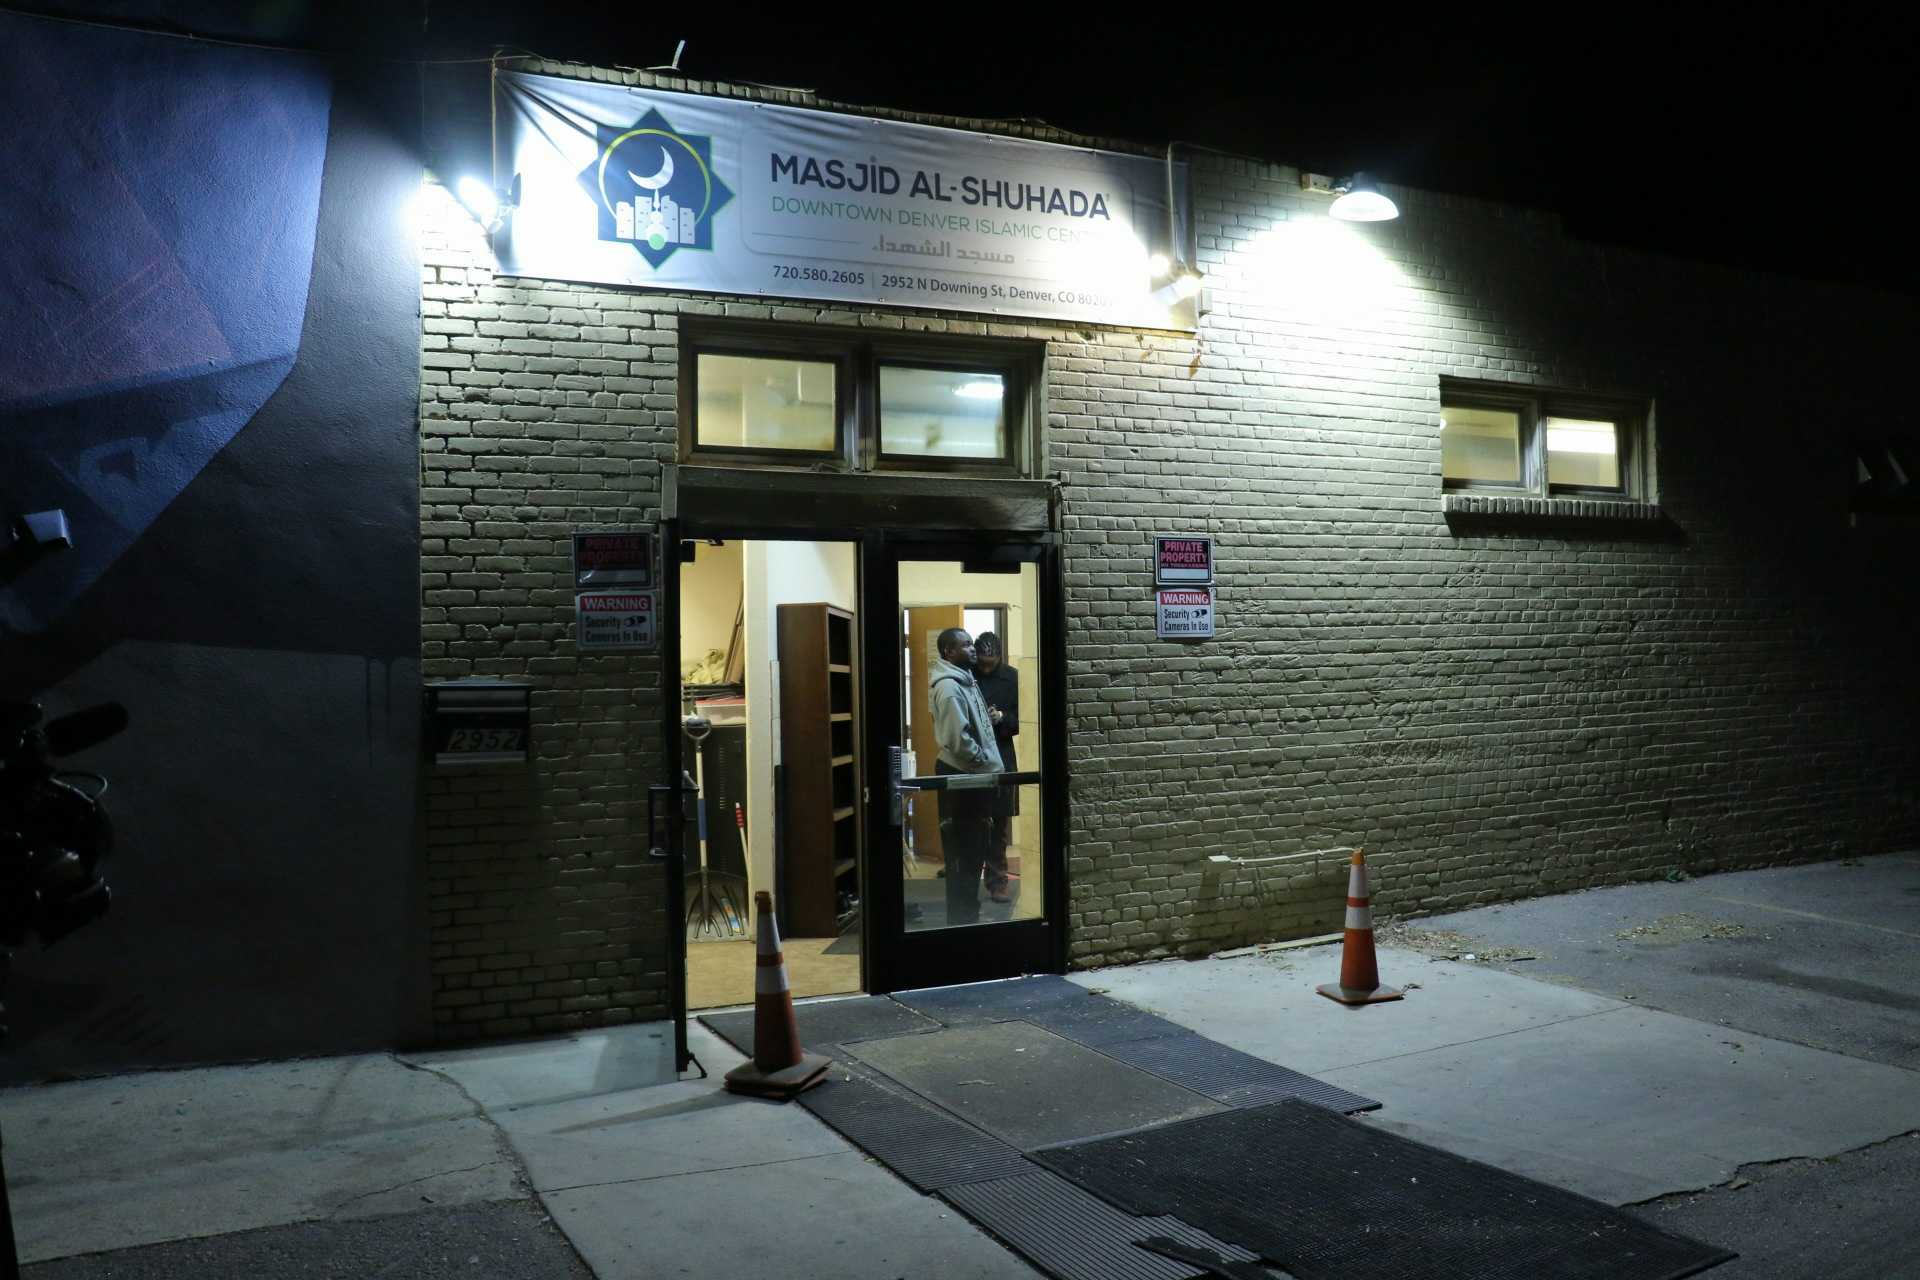 Downtown Denver Islamic Center